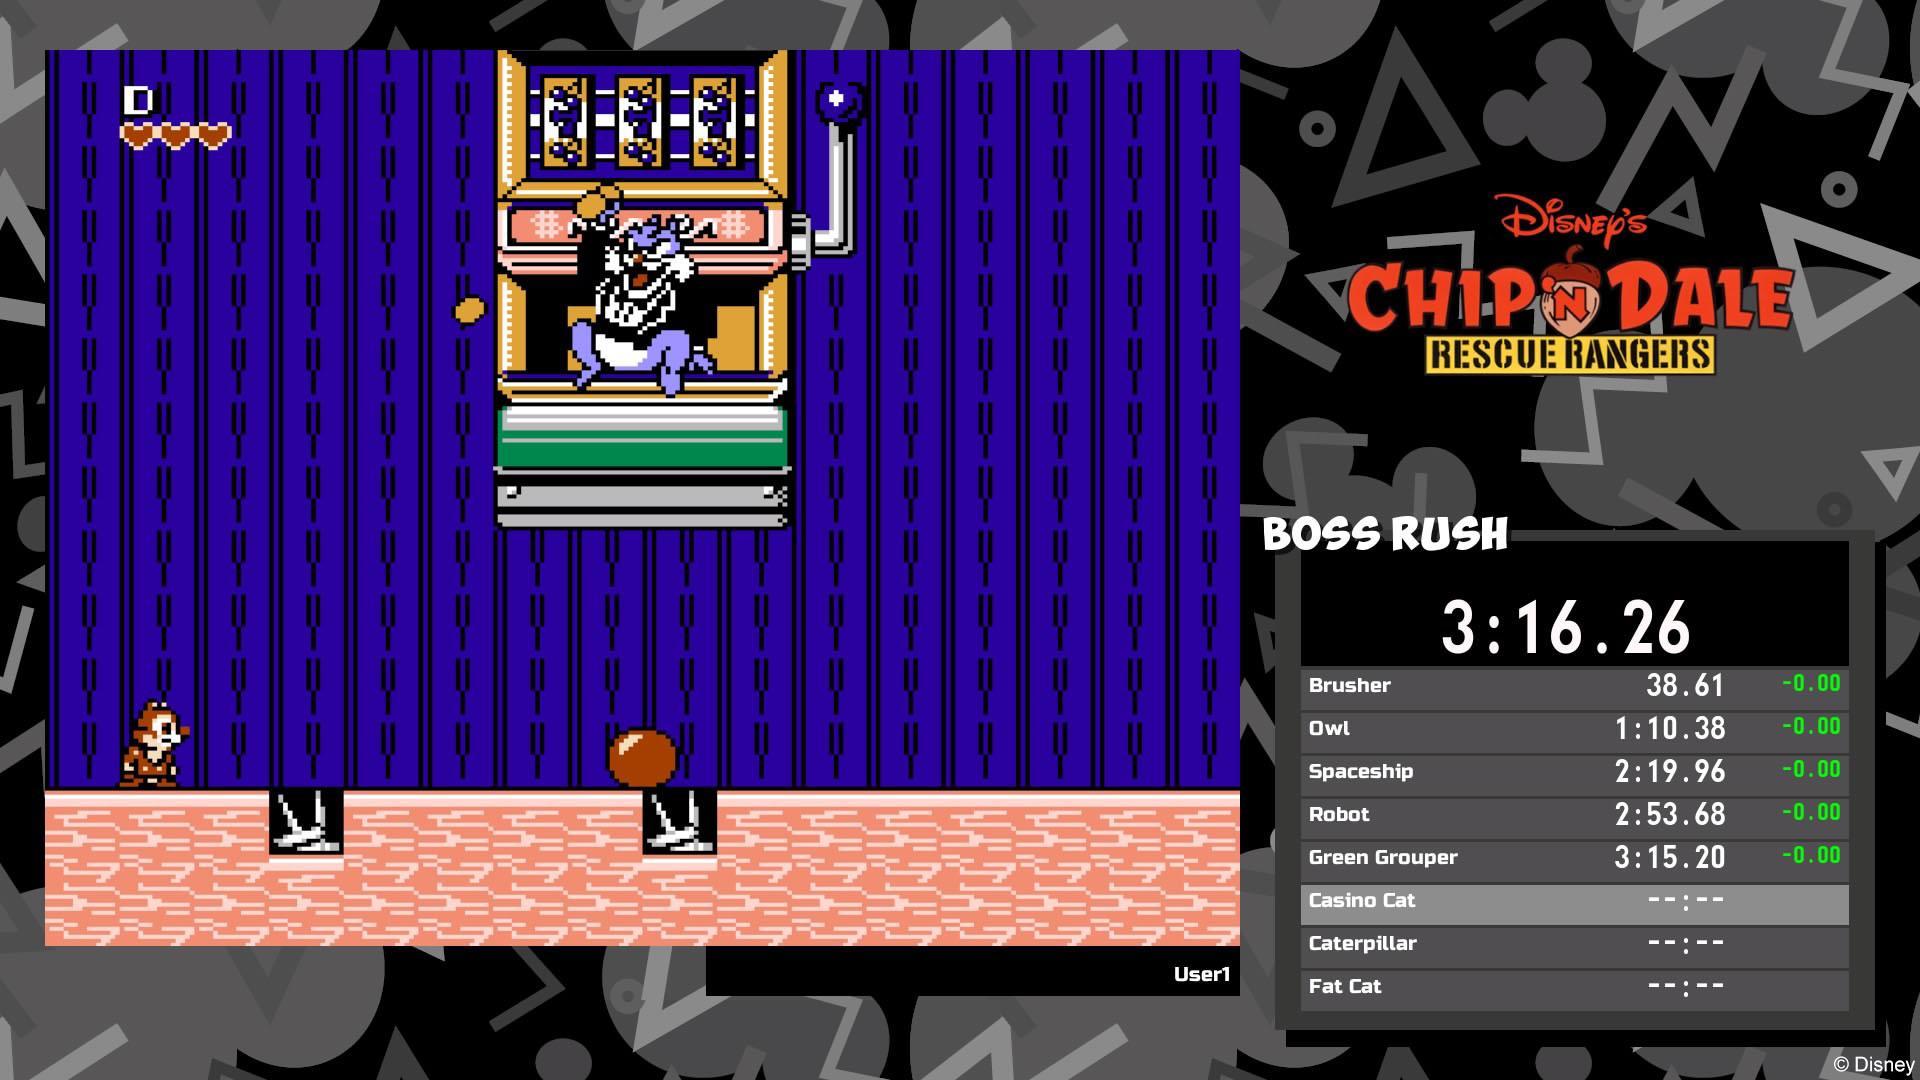 Boss_Rush_-_Rescue_Rangers.jpg